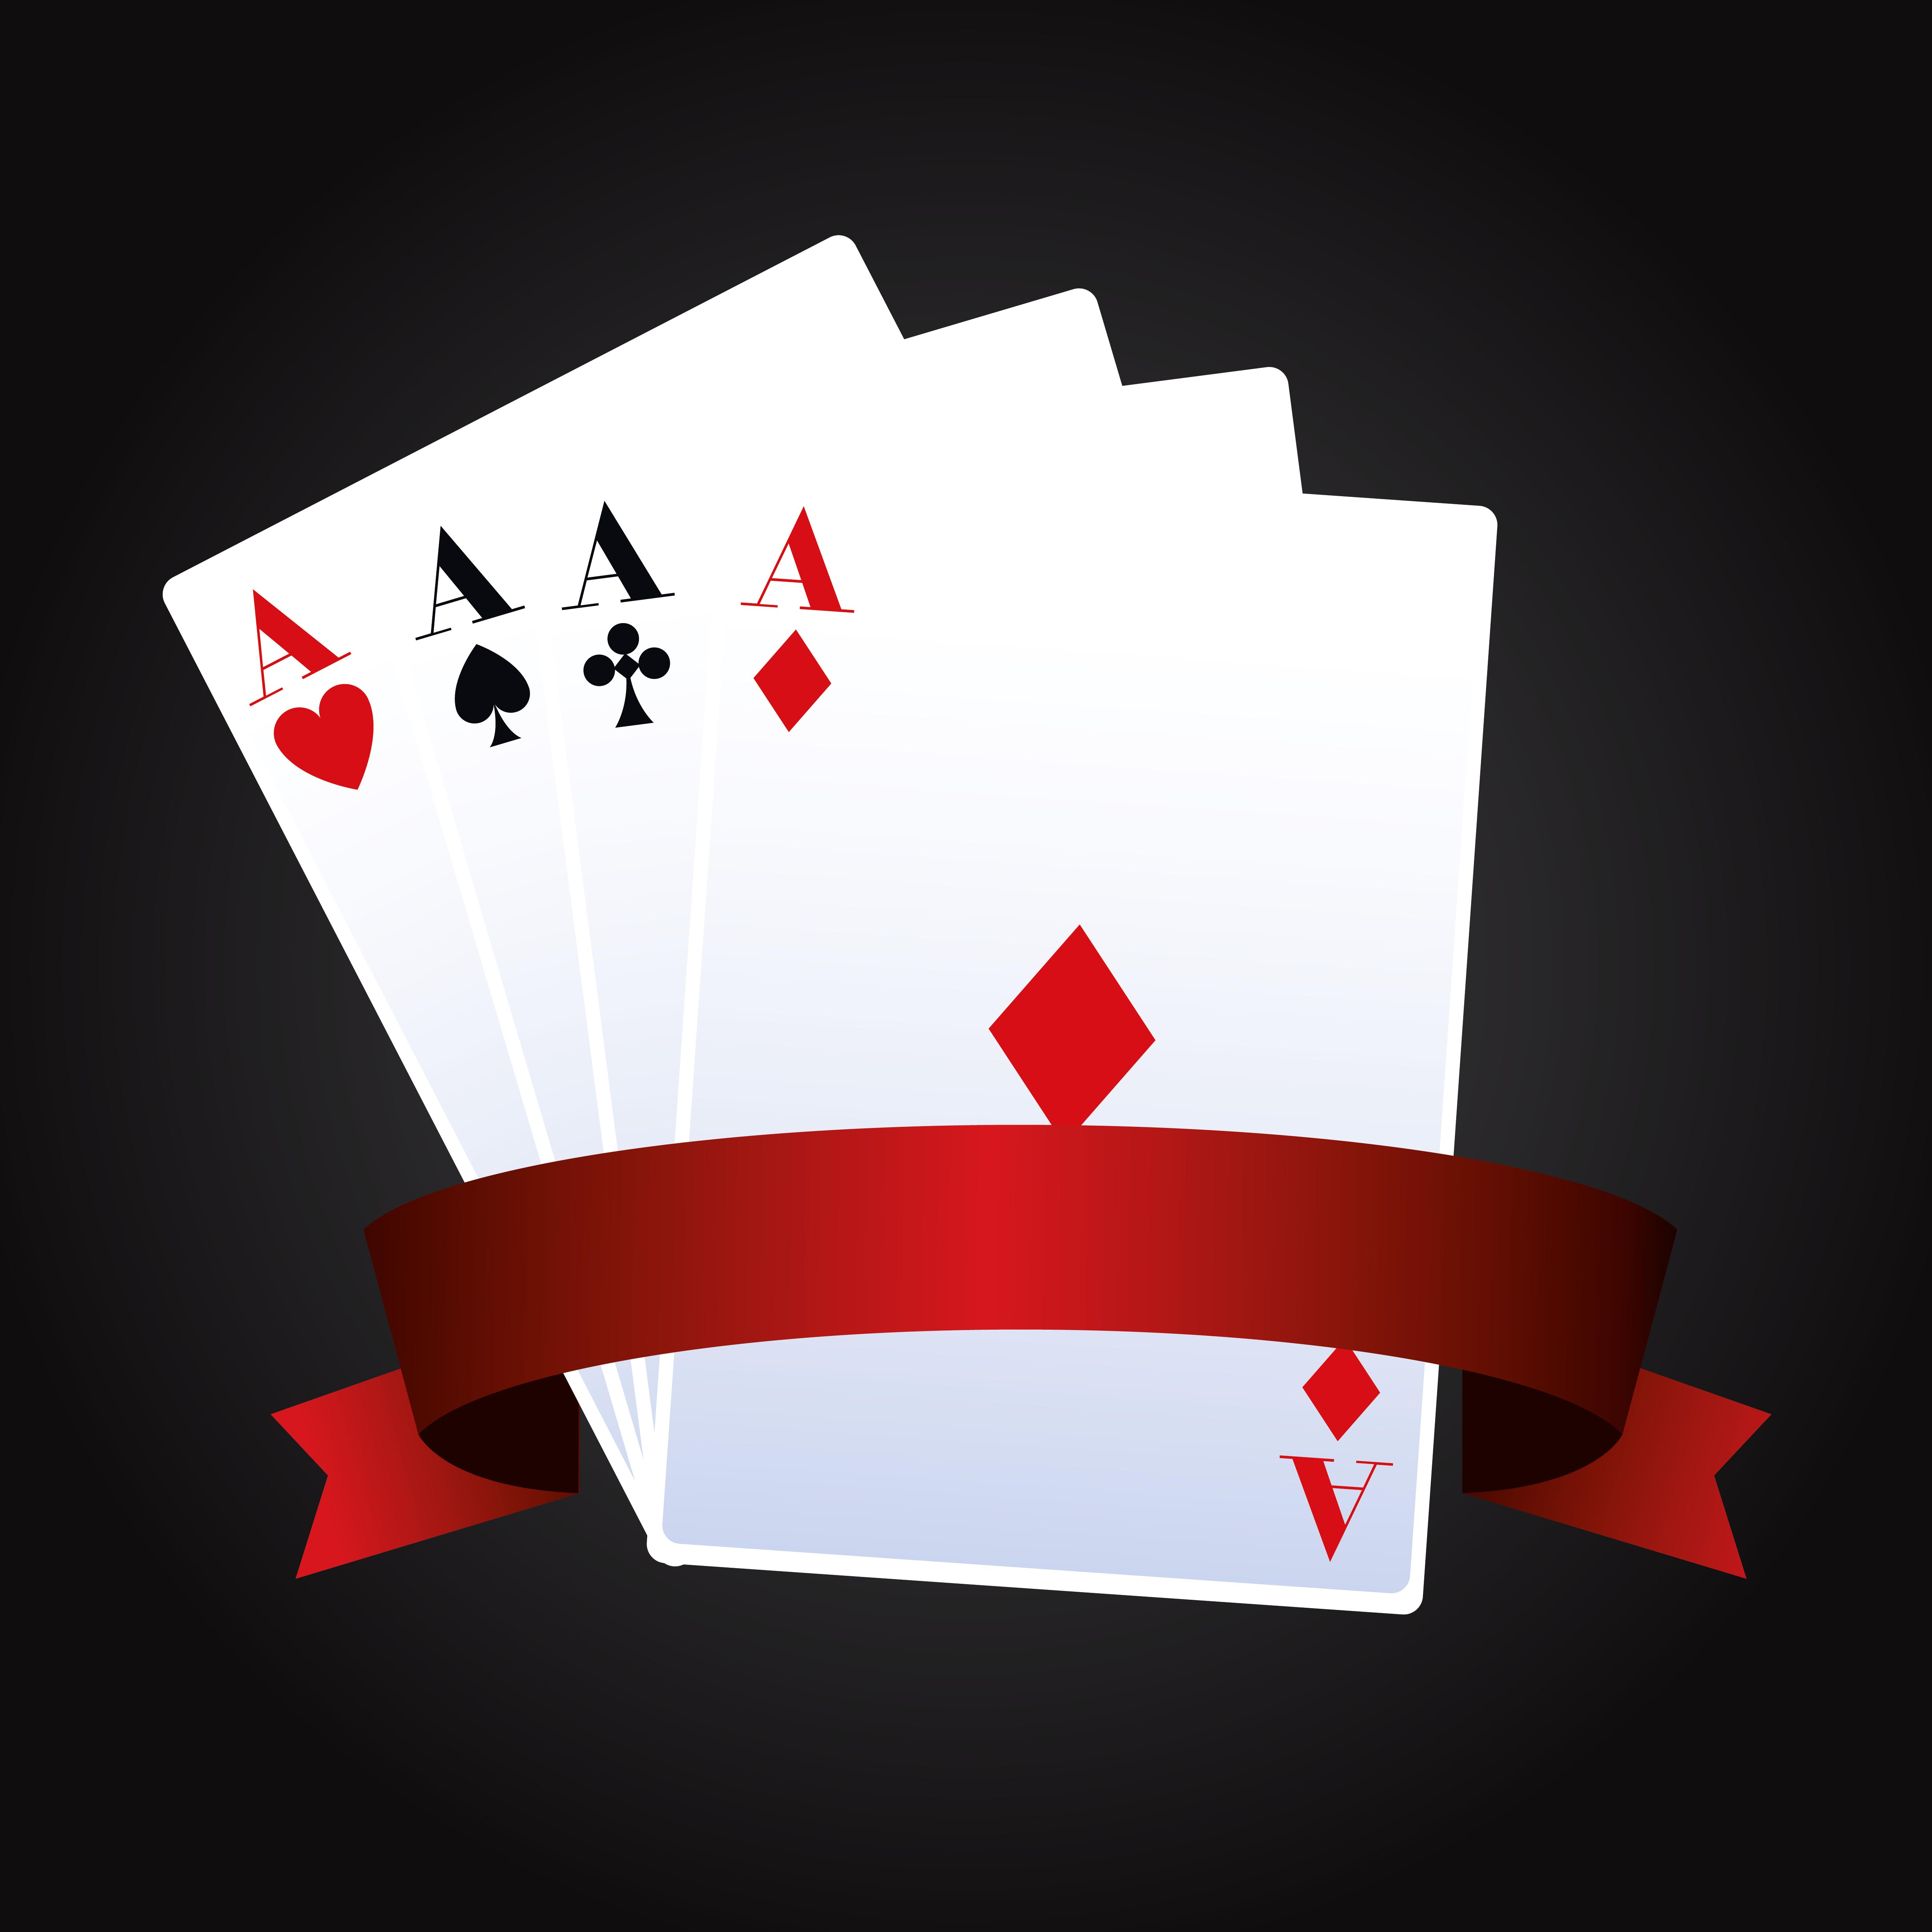 Poker Cards Game Download Free Vectors Clipart Graphics Vector Art